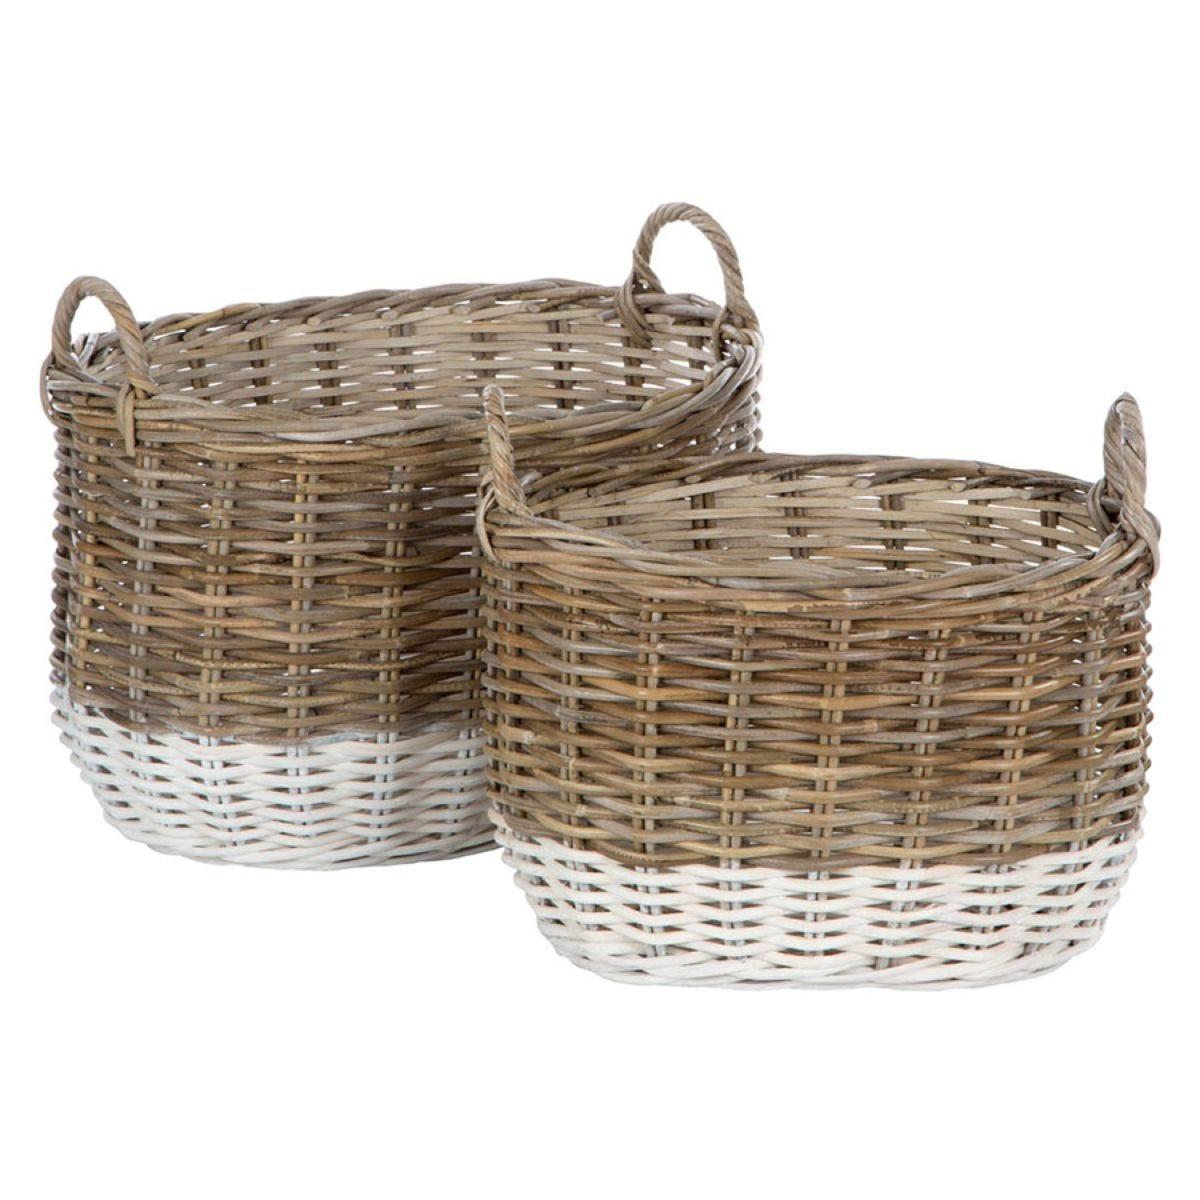 Premier Housewares Hampstead Oval Kubu Rattan Set of 2 Storage Baskets - Grey & White